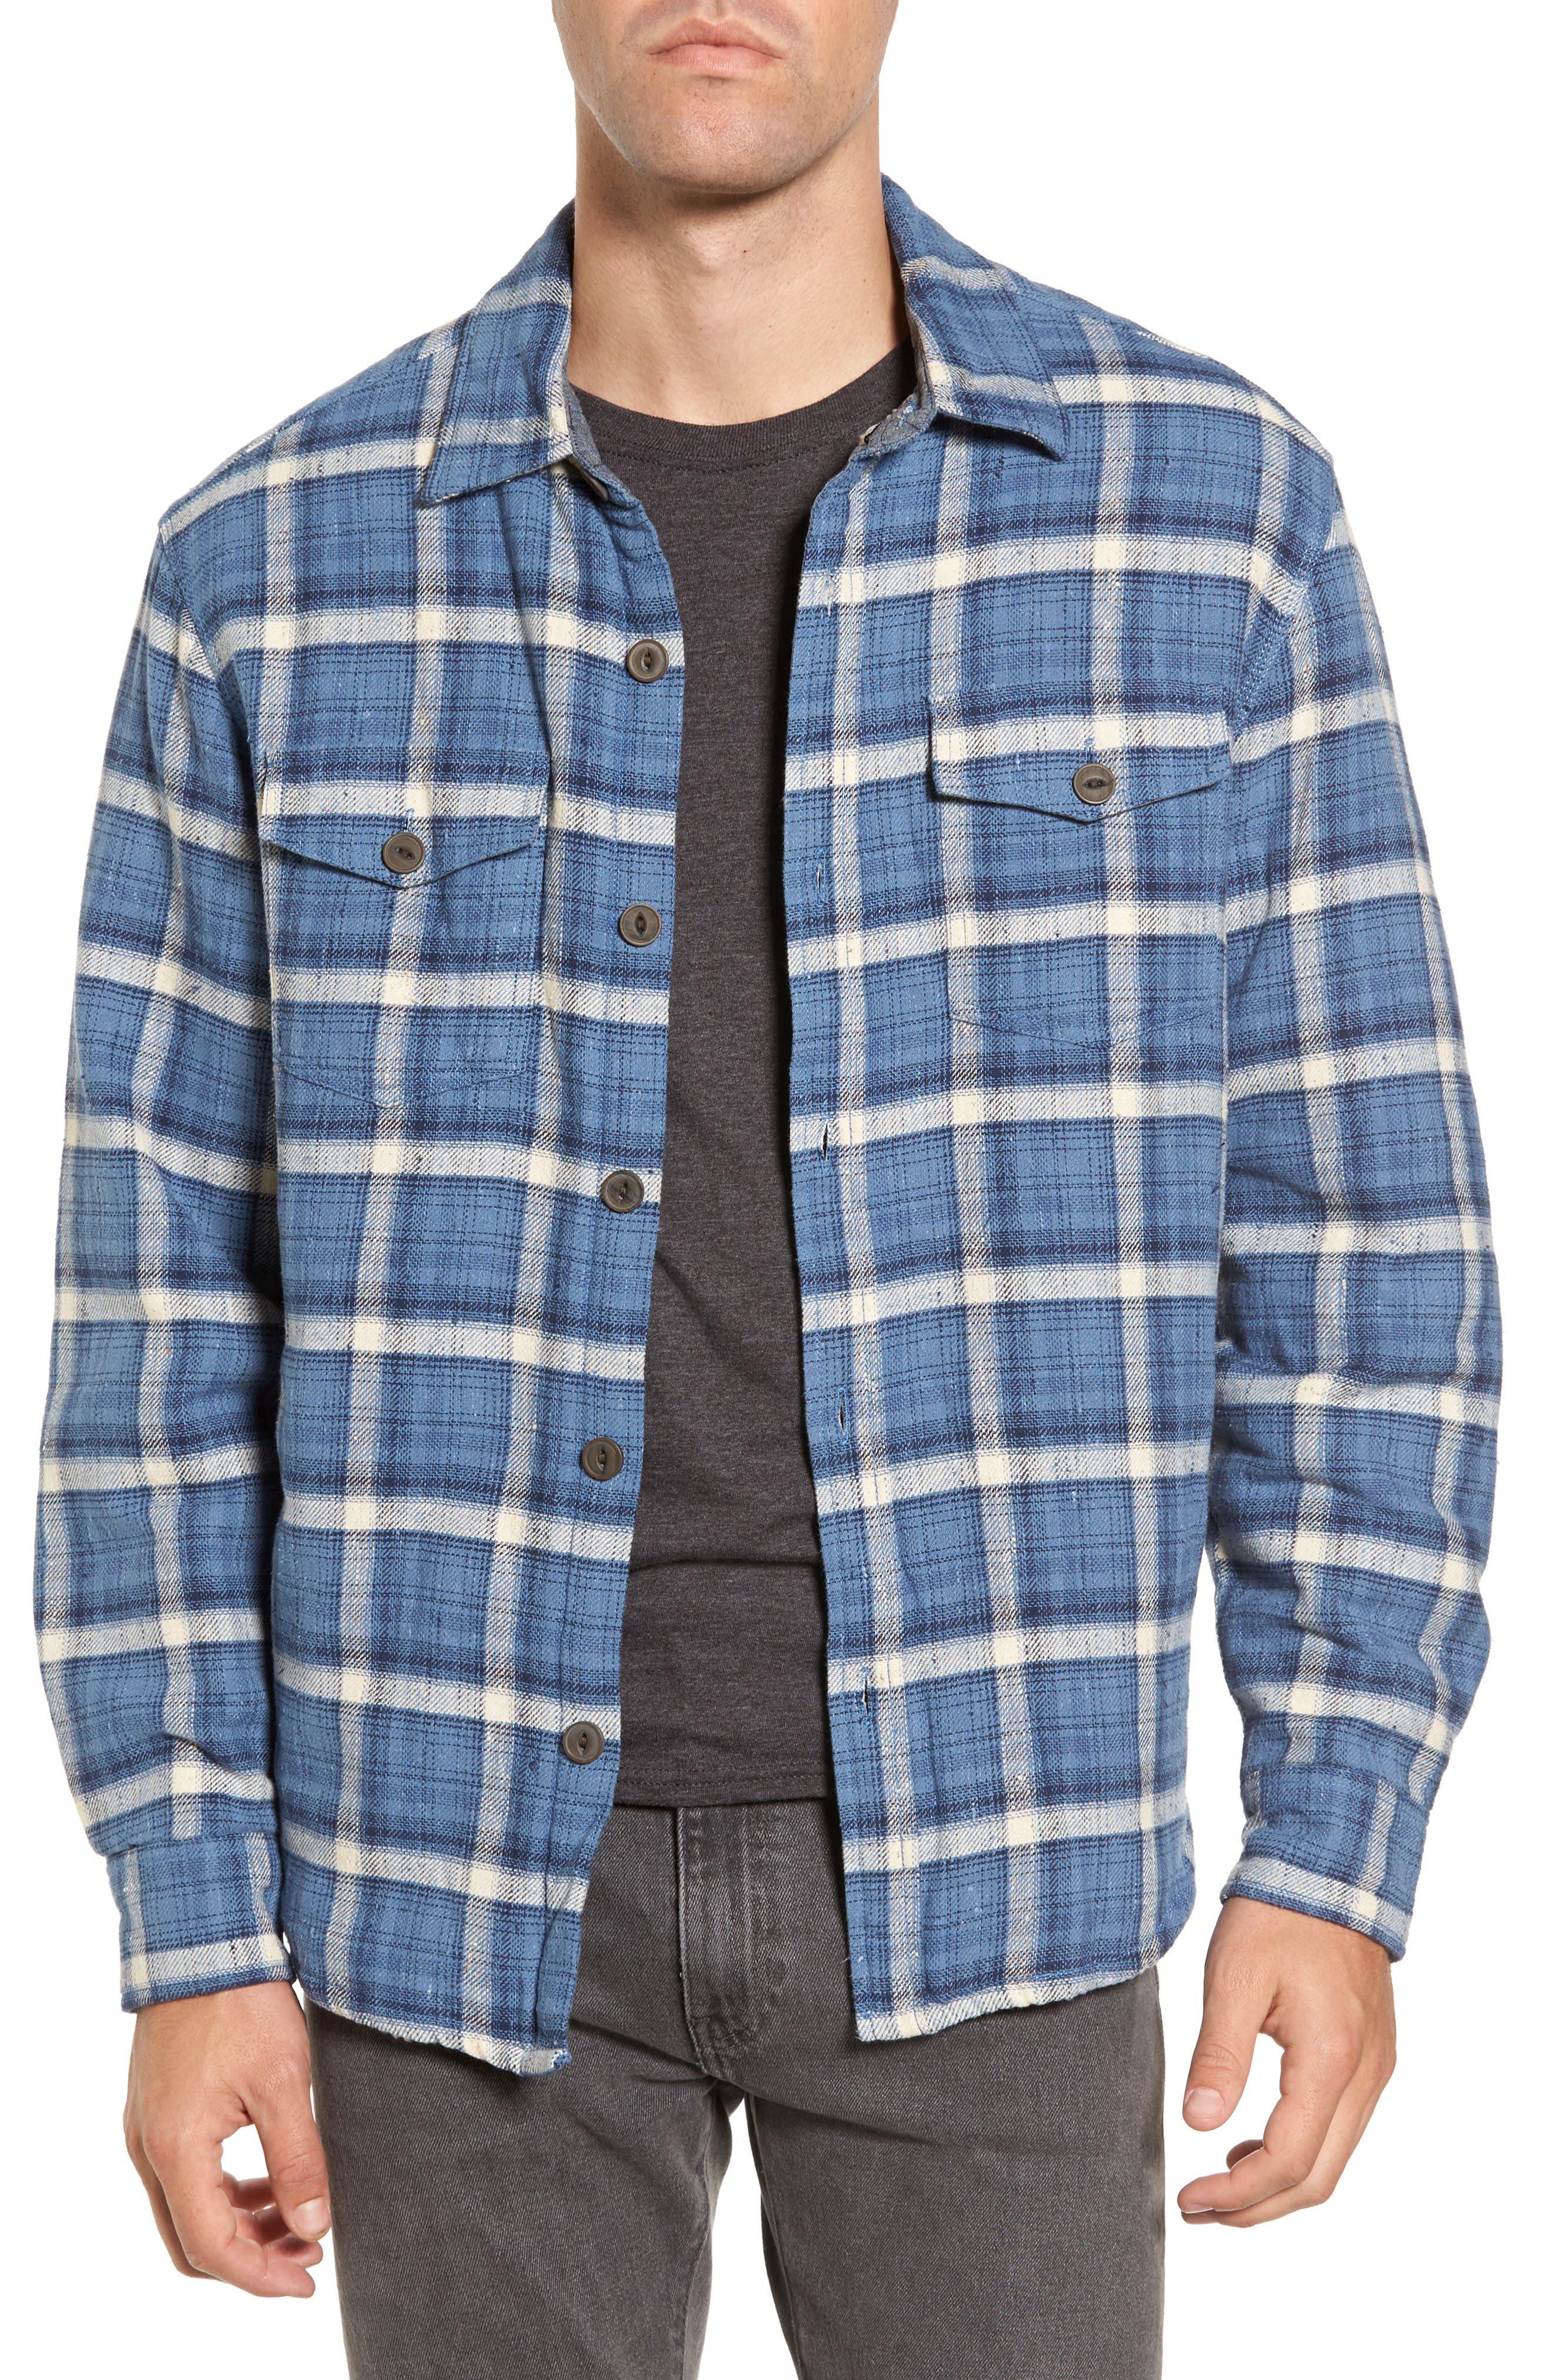 True Grit Summit Plaid Faux Shearling Lined Shirt Jacket